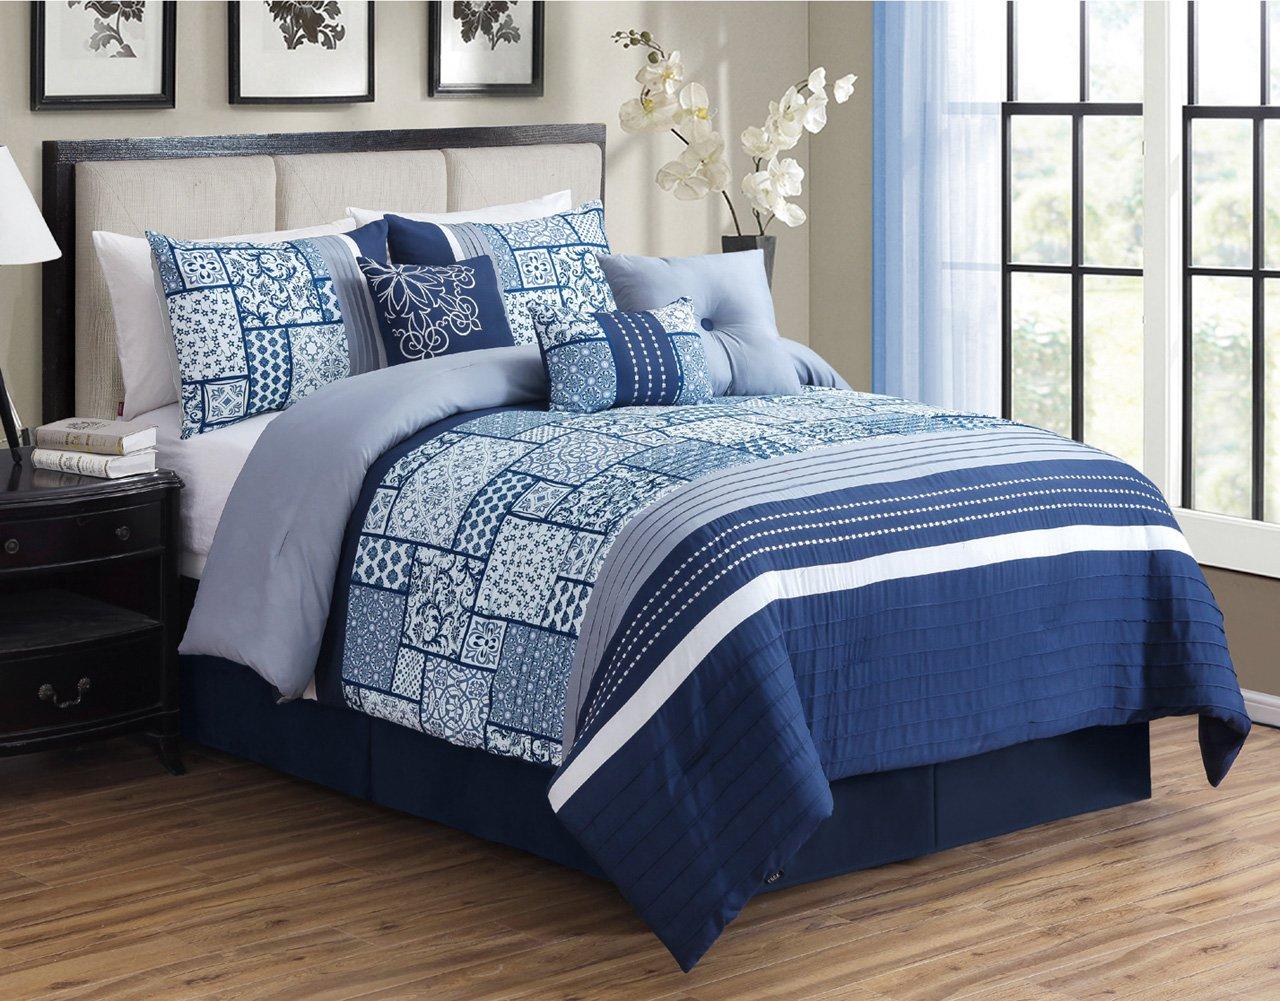 11 Piece Auburn Navy/White Bed in a Bag Set Queen